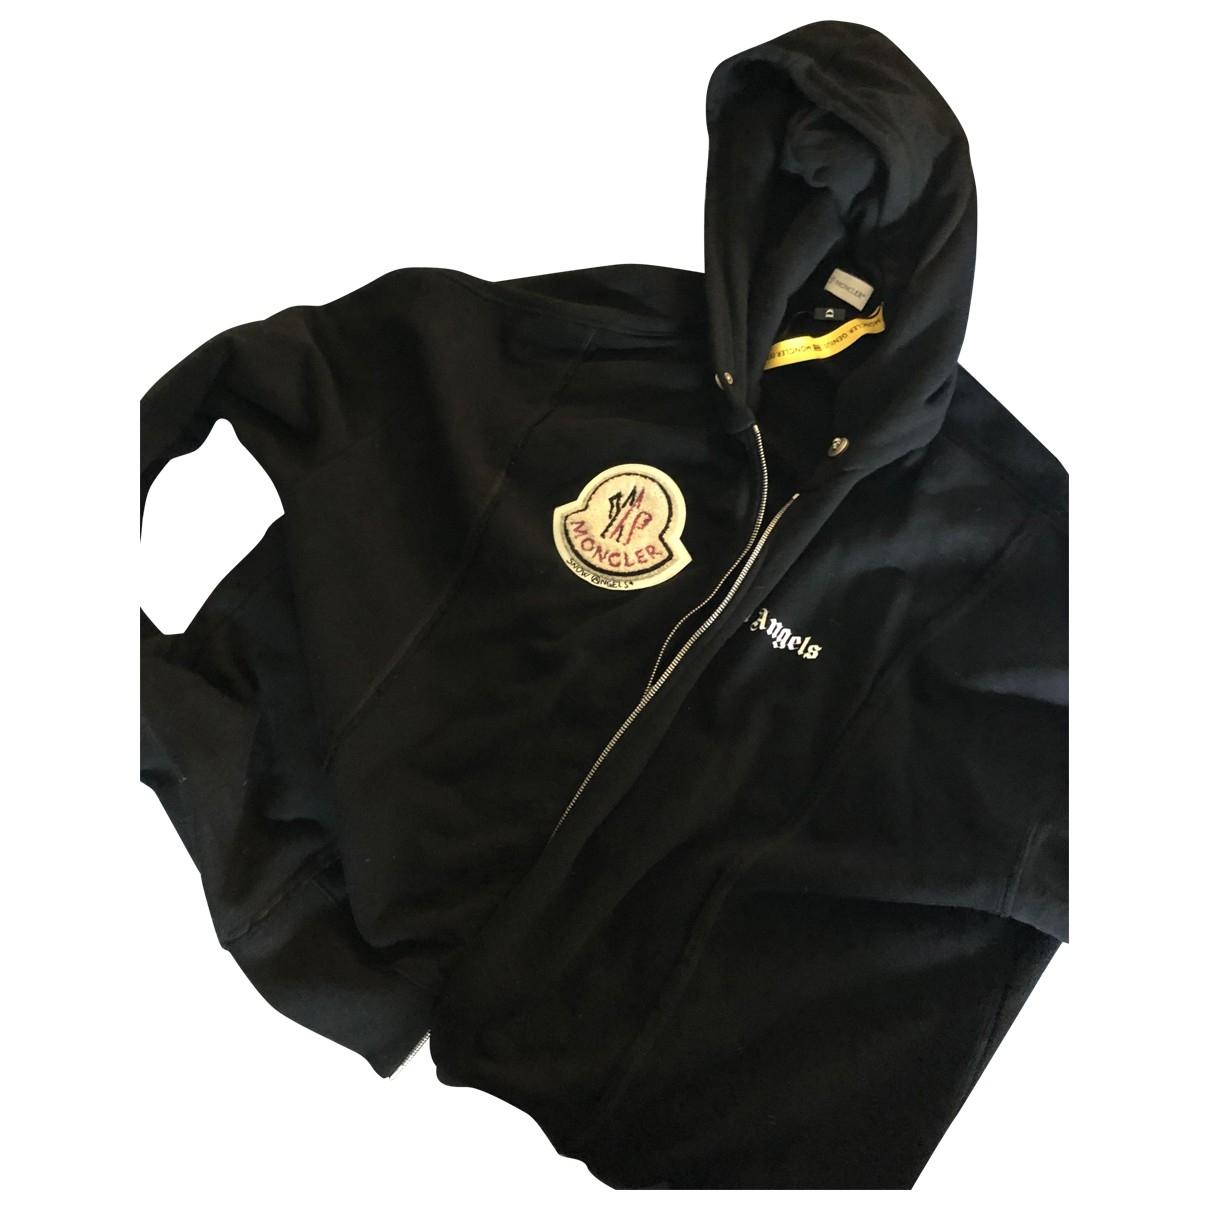 Moncler Genius Moncler n°8 Palm Angels Black Cotton Knitwear & Sweatshirts for Men M International